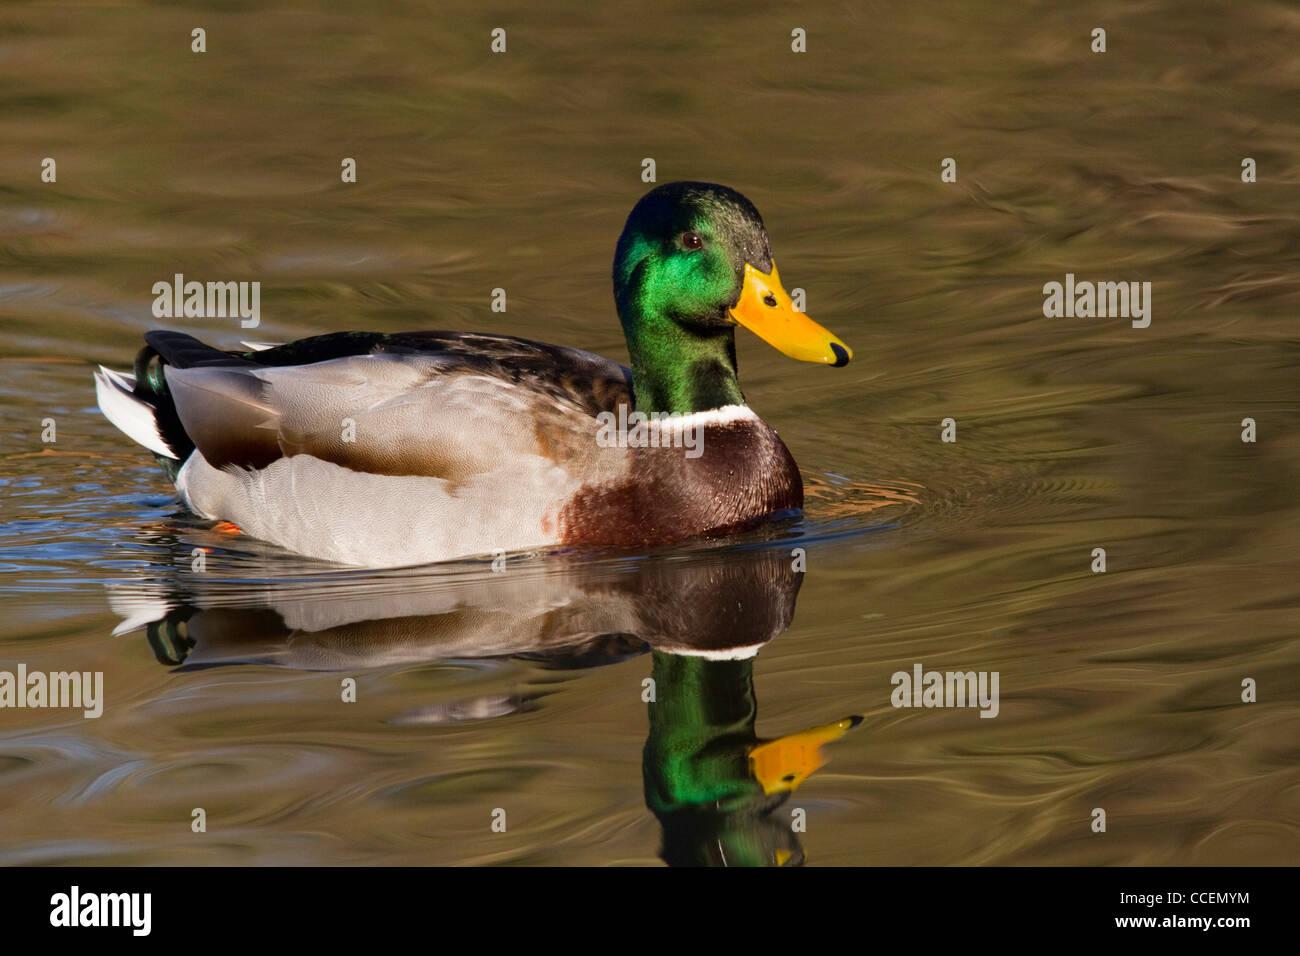 Male mallard duck, Anas platyrhynchos, Surrey, England, UK - Stock Image